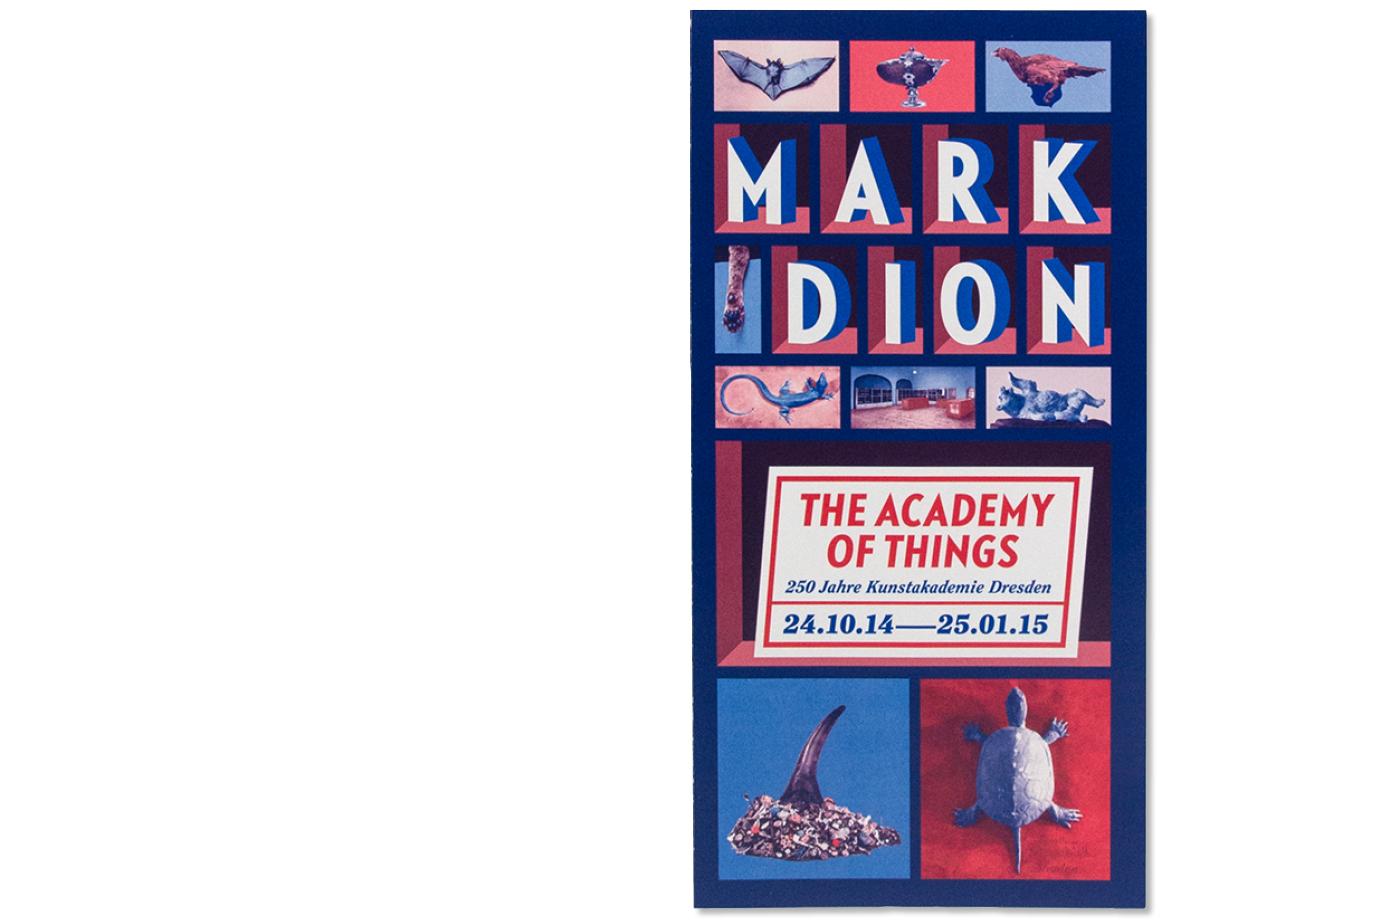 http://e-o-t.de/wordpress/wp-content/uploads/2017/10/2014_eot-MarkDion-Identity-05.jpg